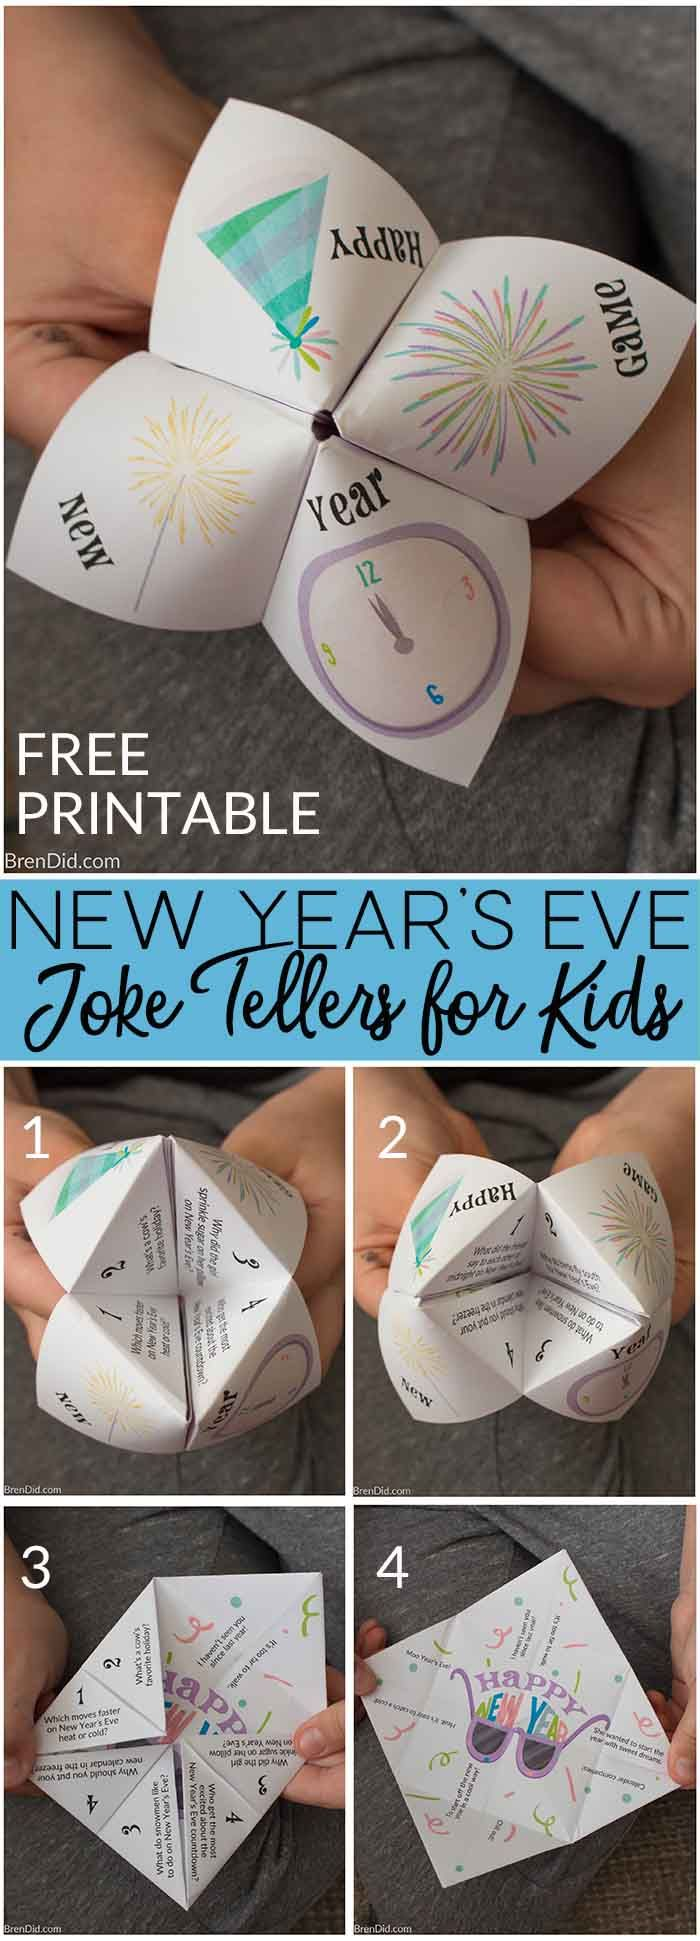 New Years Eve joke tellers | New Years Eve jokes | New Years Eve party | winter party | free printable | New Years Eve jokes for kids |  cootie catcher |  fortune teller #NewYearsEve #StreamTeam #joketeller via @brendidblog